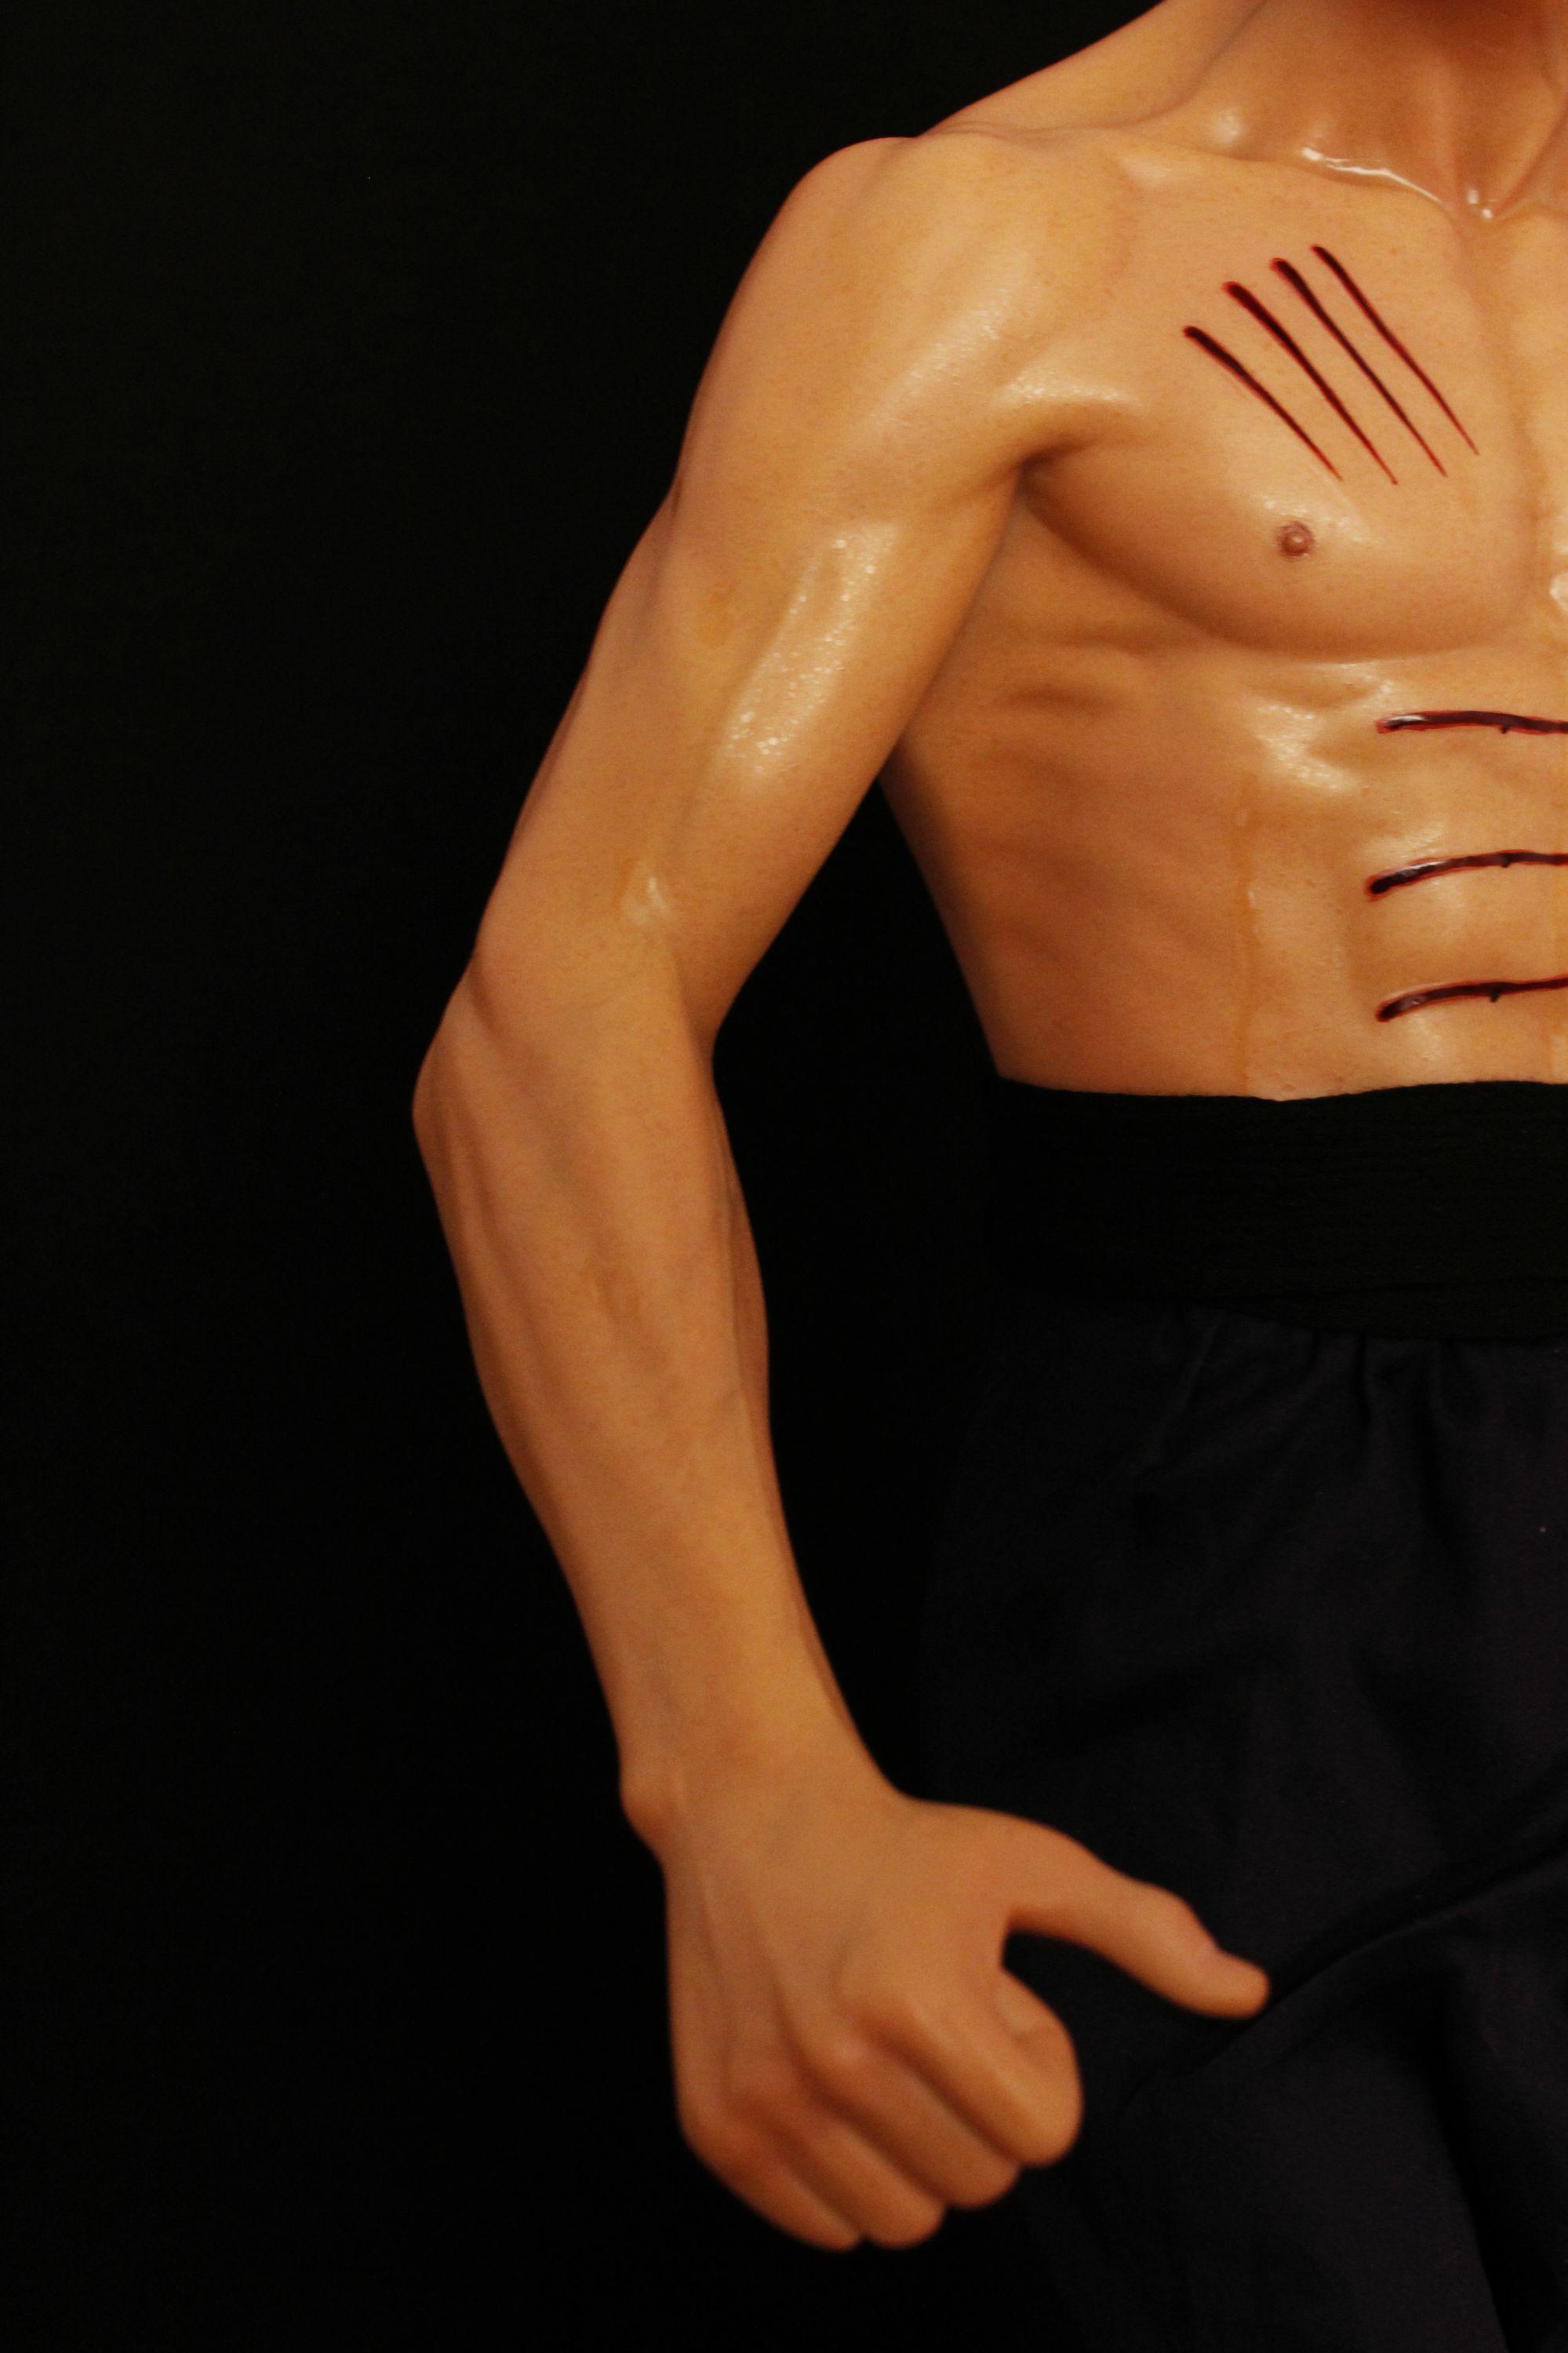 [Blitzway] Bruce Lee Tribute - 1/3 Scale - LANÇADO!!! - Página 6 211419zskb3kc3bcszzp3g